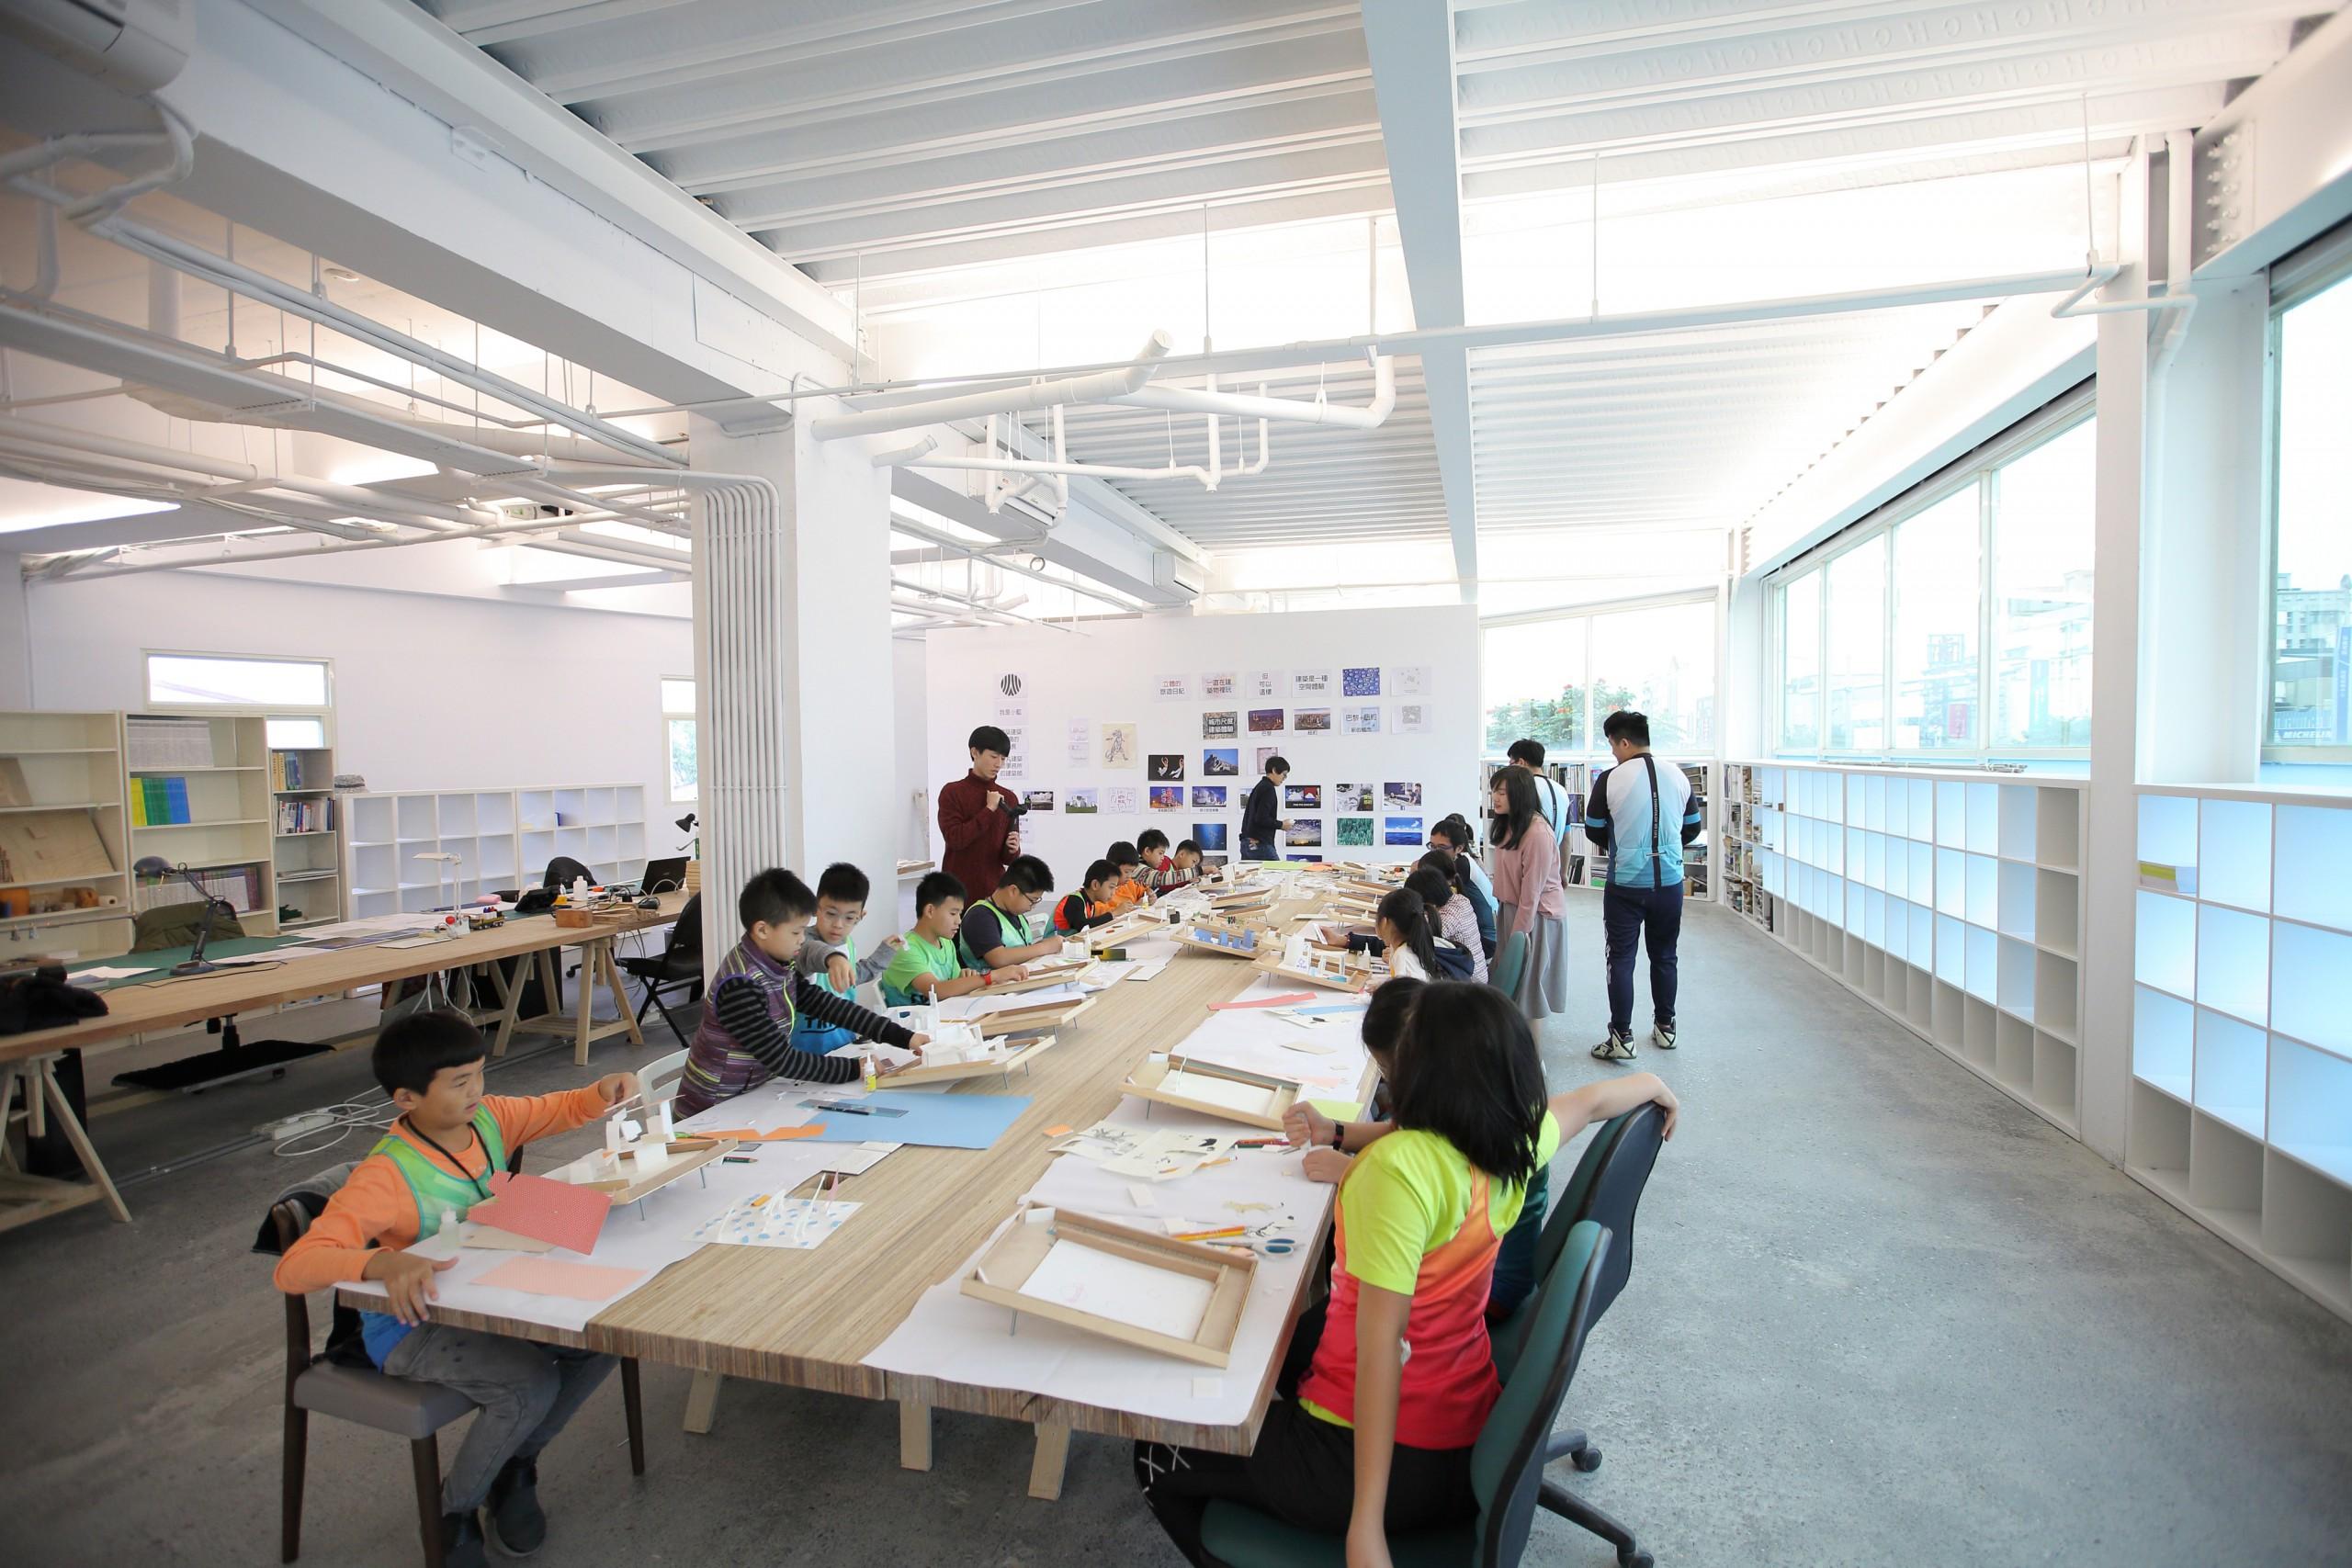 德築-DEZU-project-德築建築工場-architecture-interior-application-2